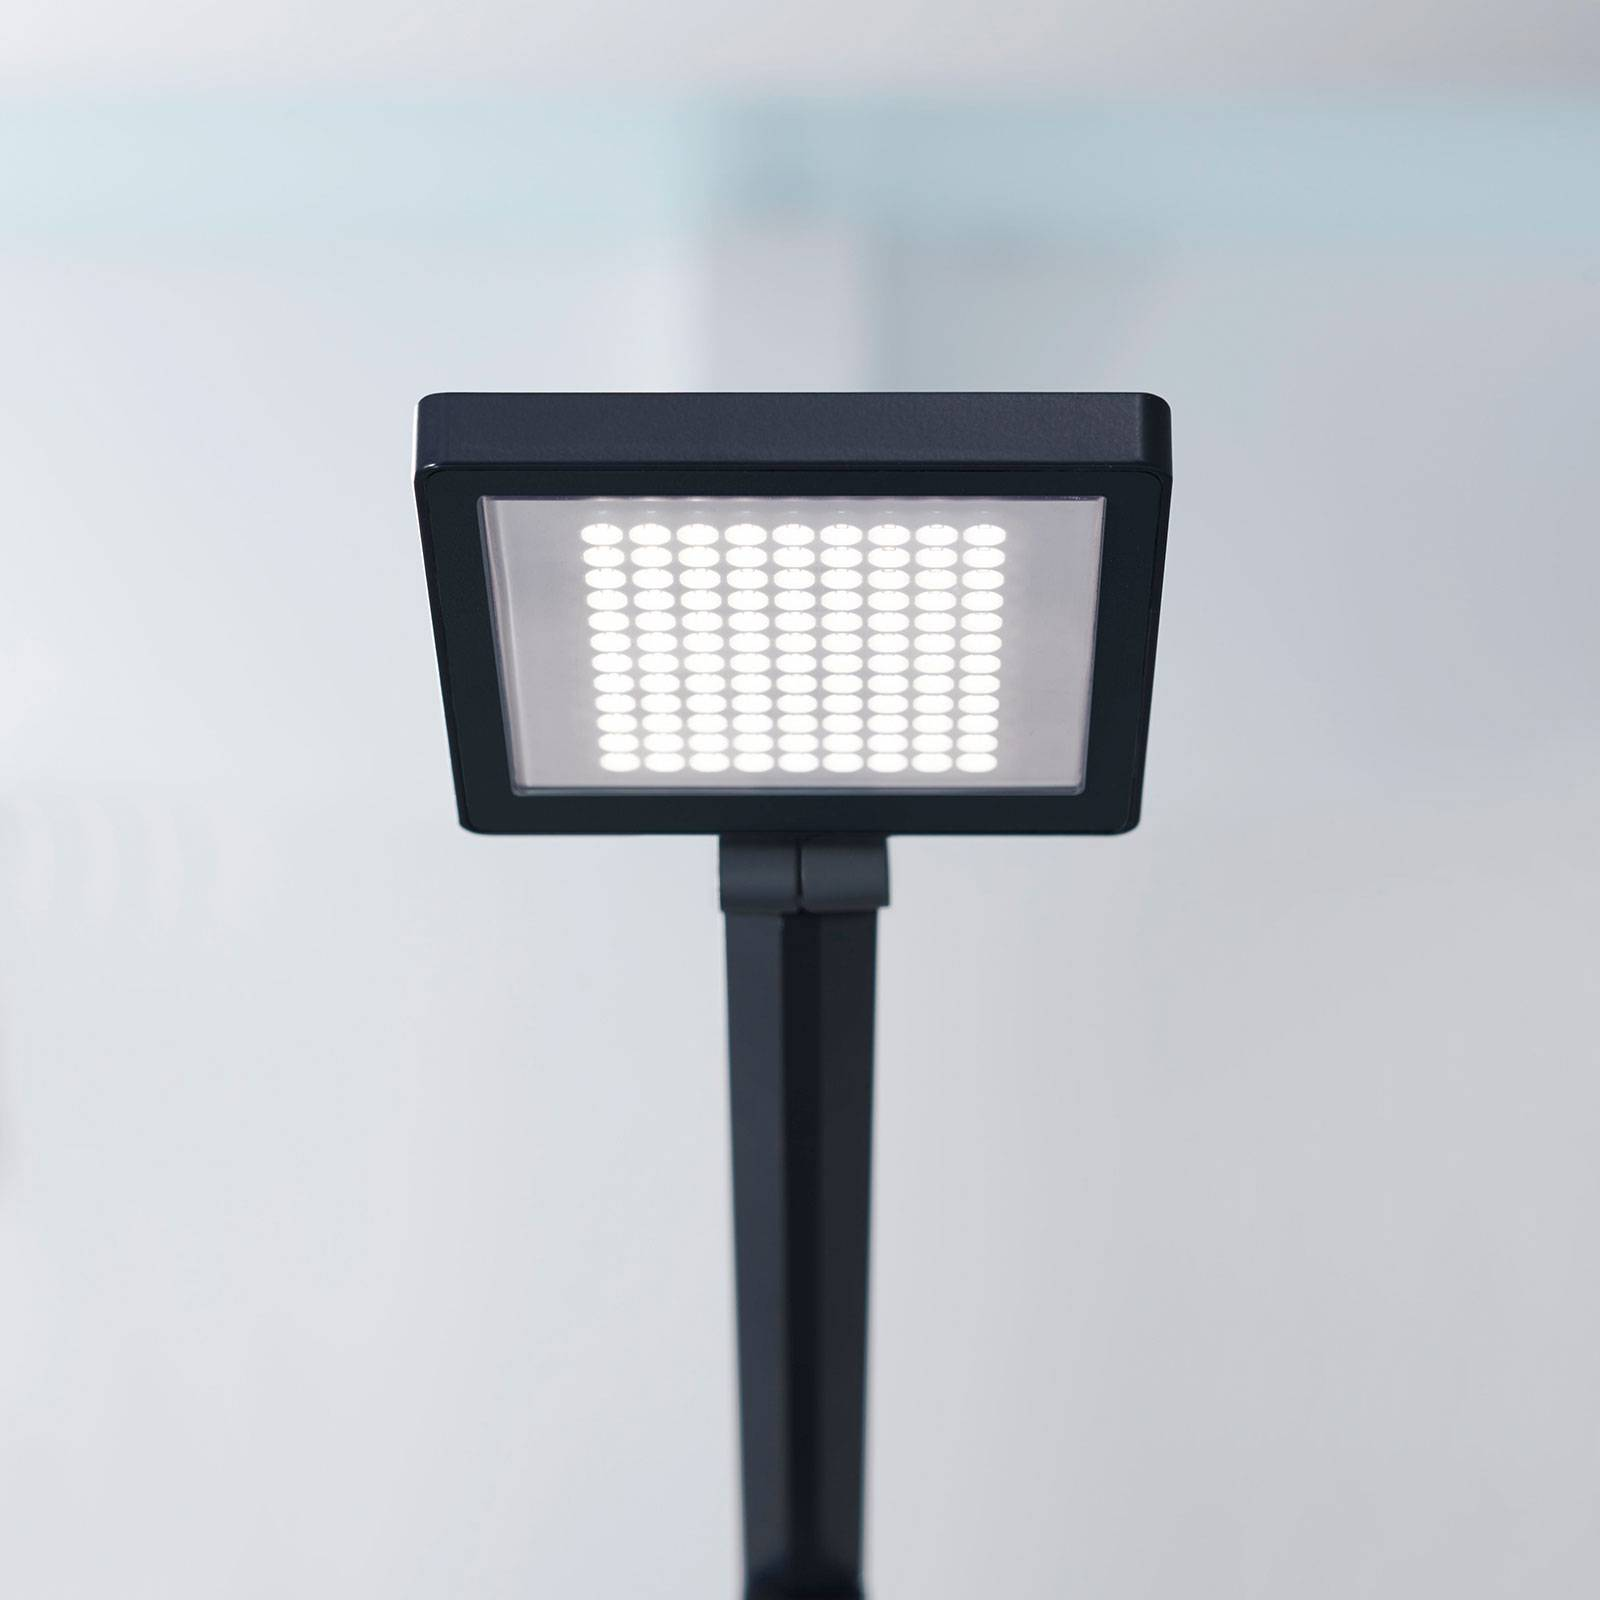 LED tafellamp PARA.MI FTL 108 R zwart 930